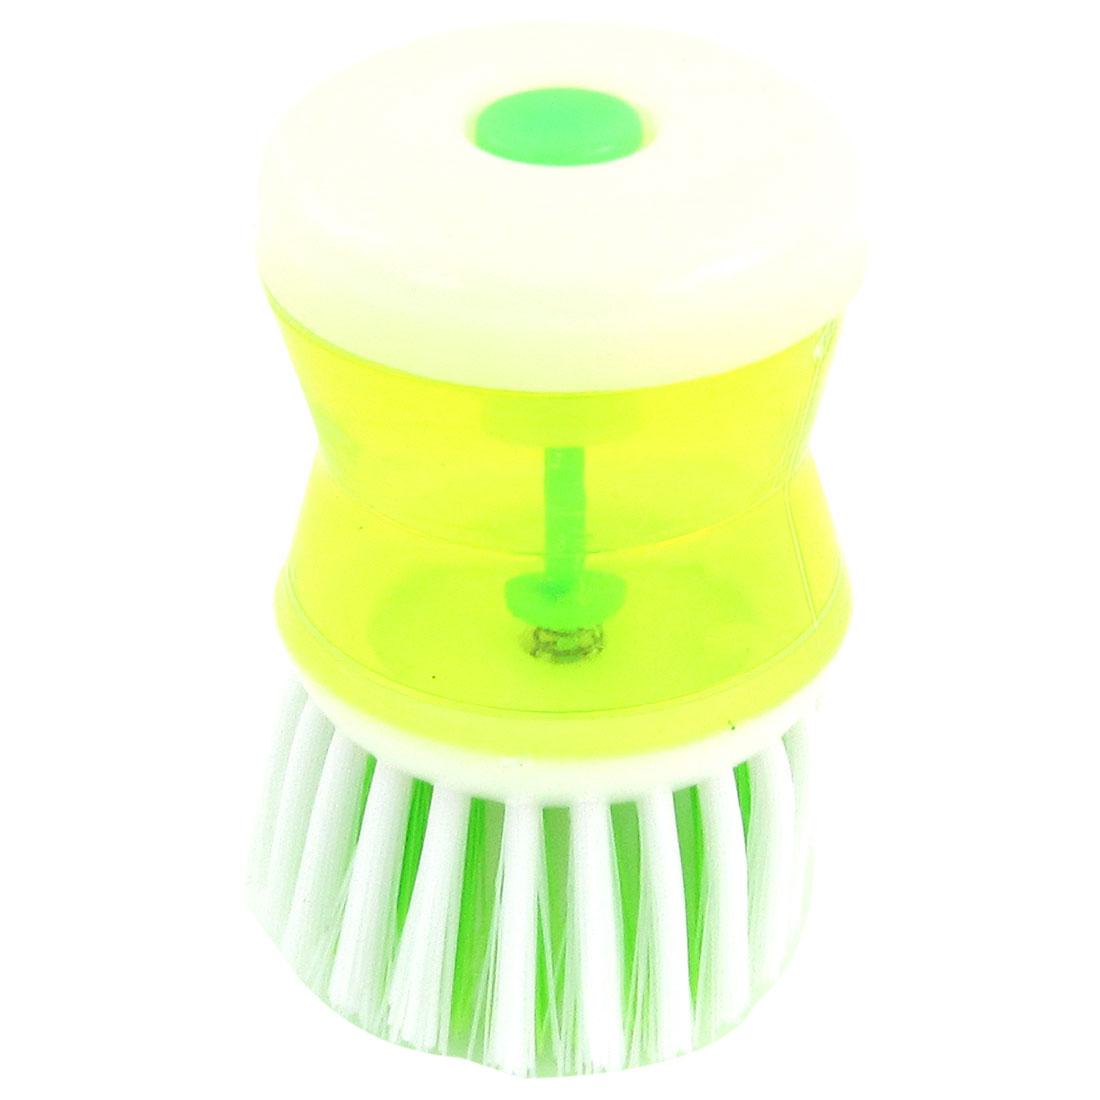 Yellowgreen White Plastic Grip Kitchen Pot Self Dispensing Cleaner Brush